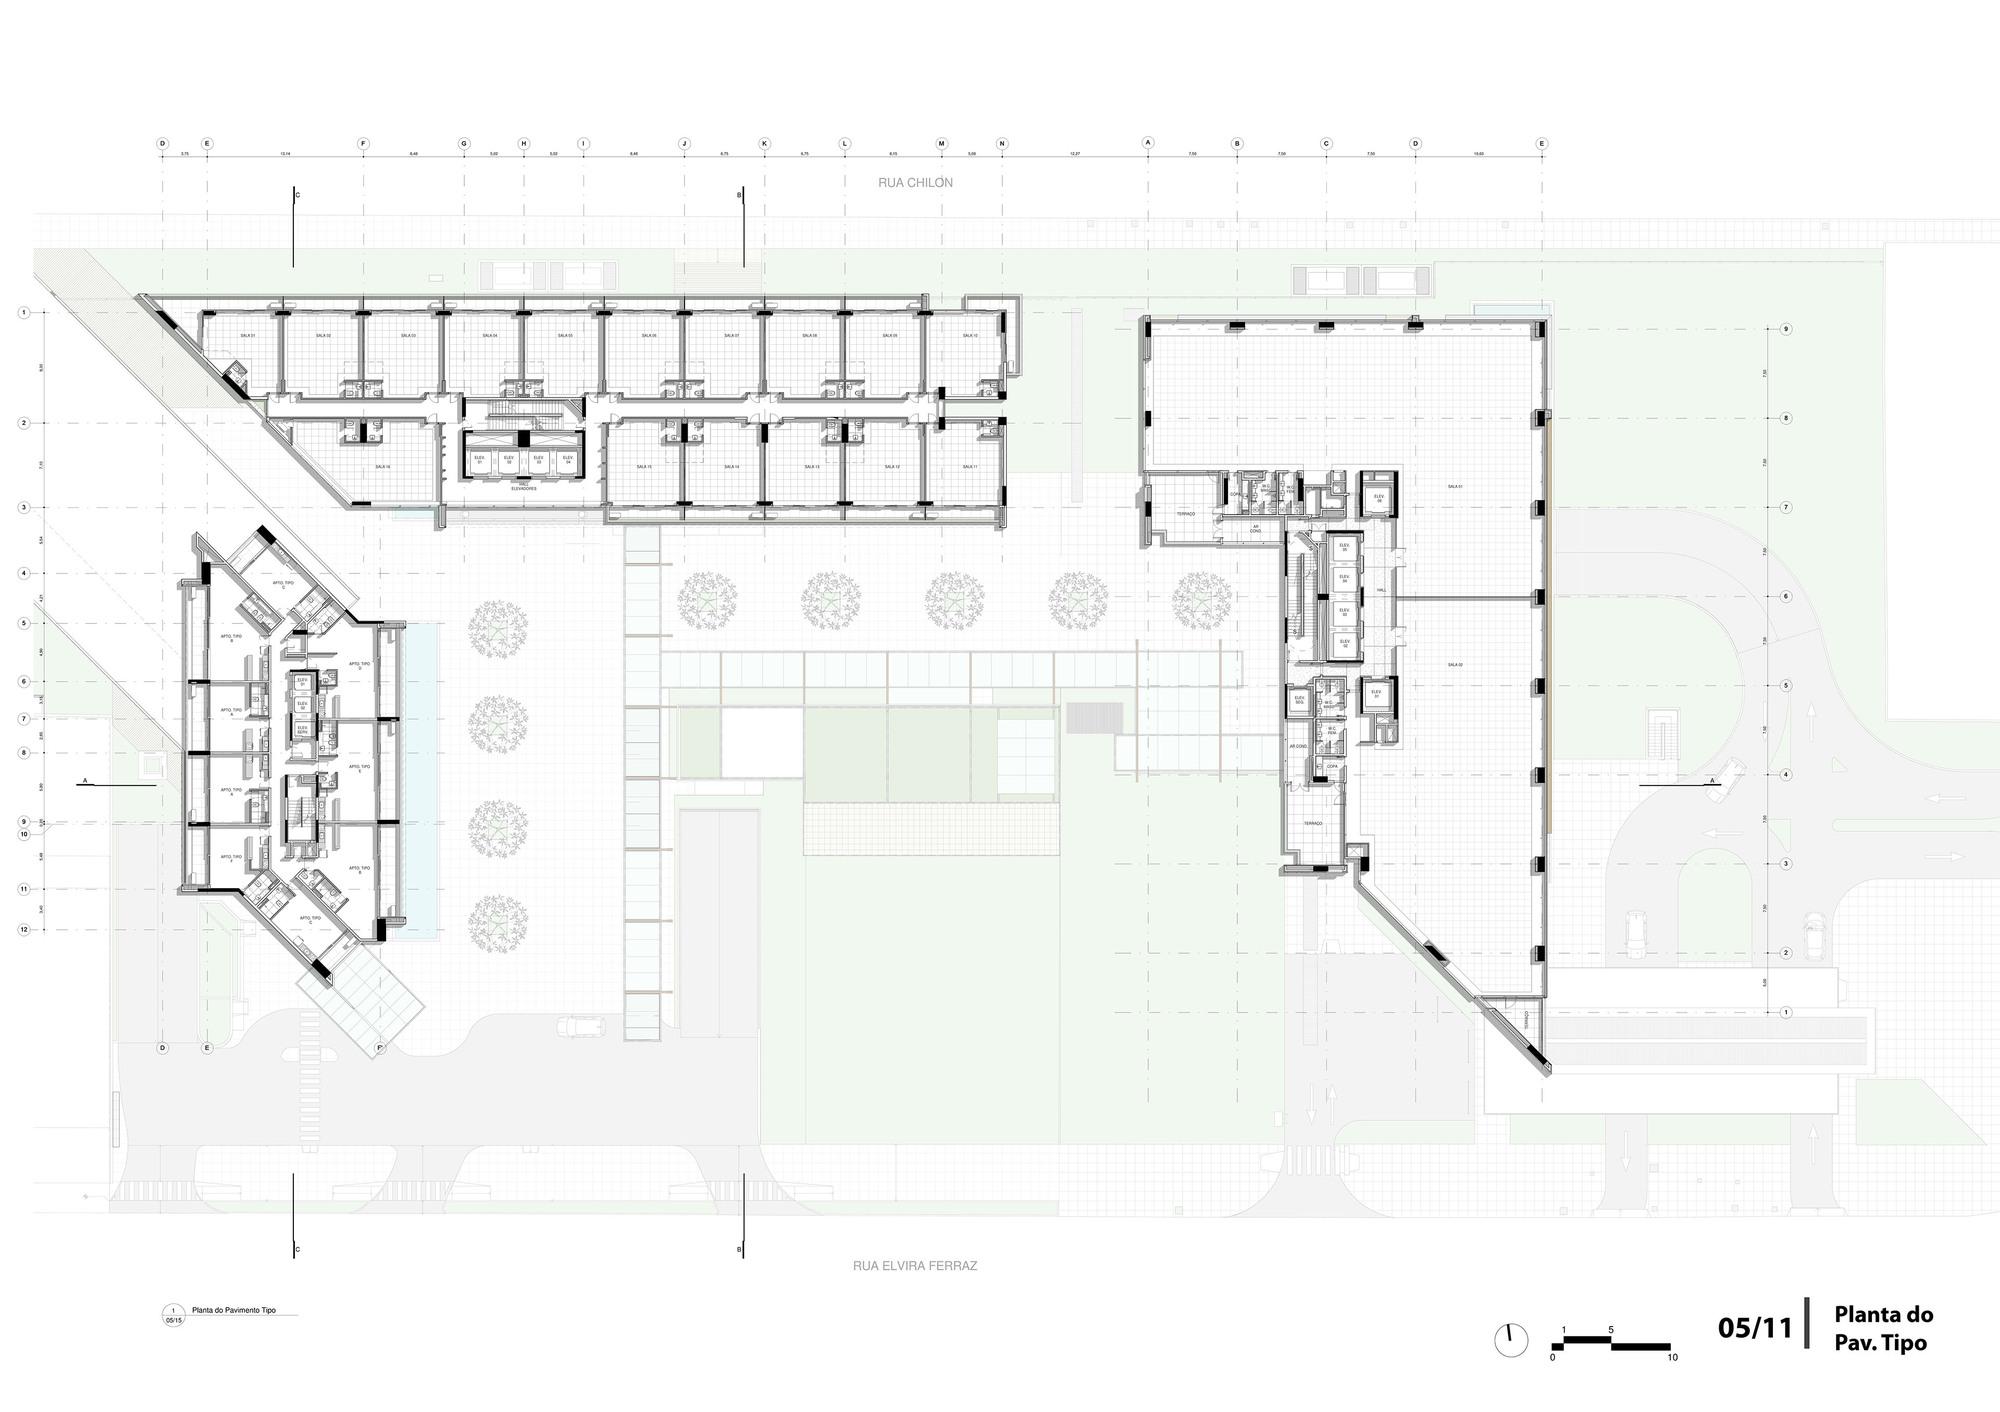 5008fc3128ba0d27a70010db Atelier Bardill Valerio Olgiati Floor Plan furthermore 55a4aaa1e58ece1fd20000ef Fl 4300 Aflalo And Gasperini Arquitetos Planta Baixa likewise Dom Grundriss additionally Floorplan besides Townhomeplane1027a Pi 2414. on floor plan